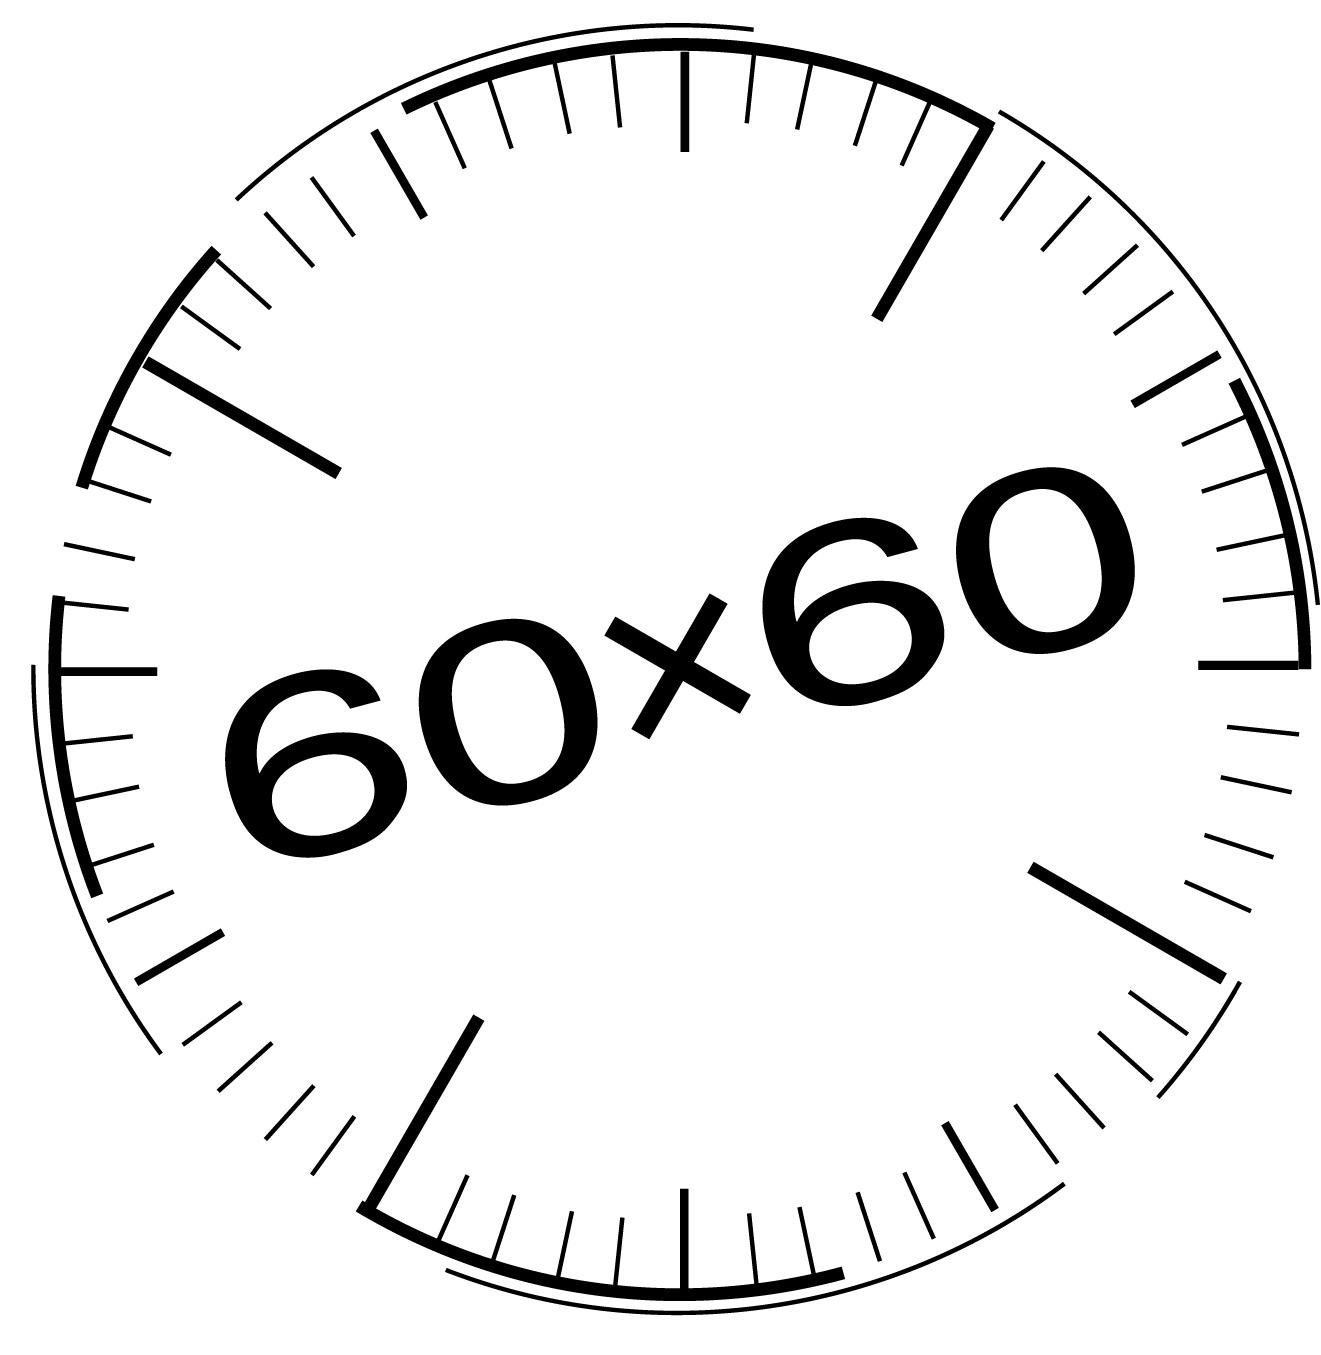 60x60 Presenters Mix